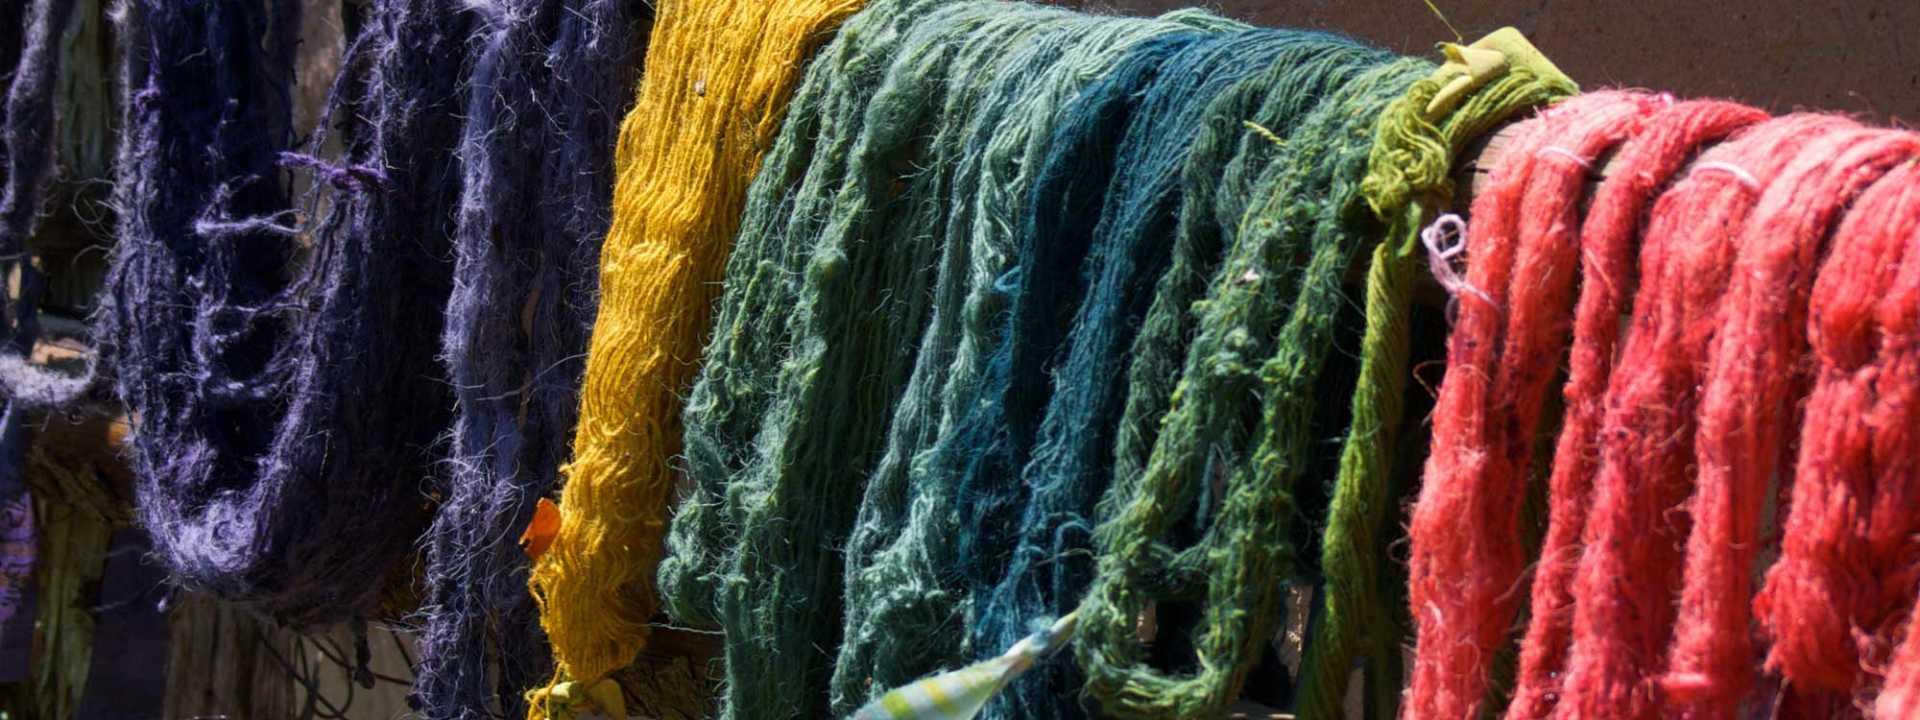 Recipe for Dying Yarn